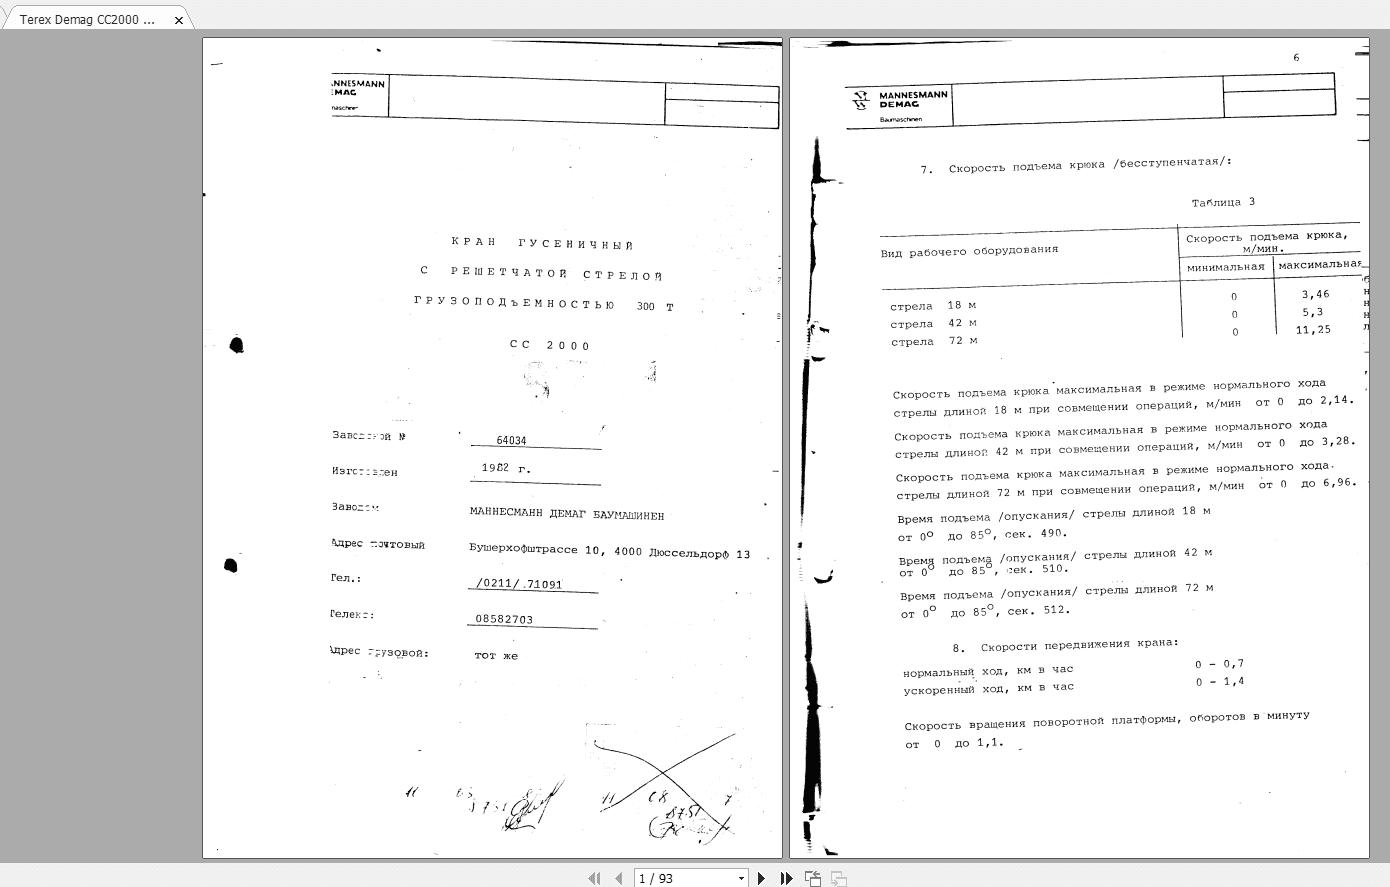 Terex_Demag_CC2000_Crawler_Crane_Passport